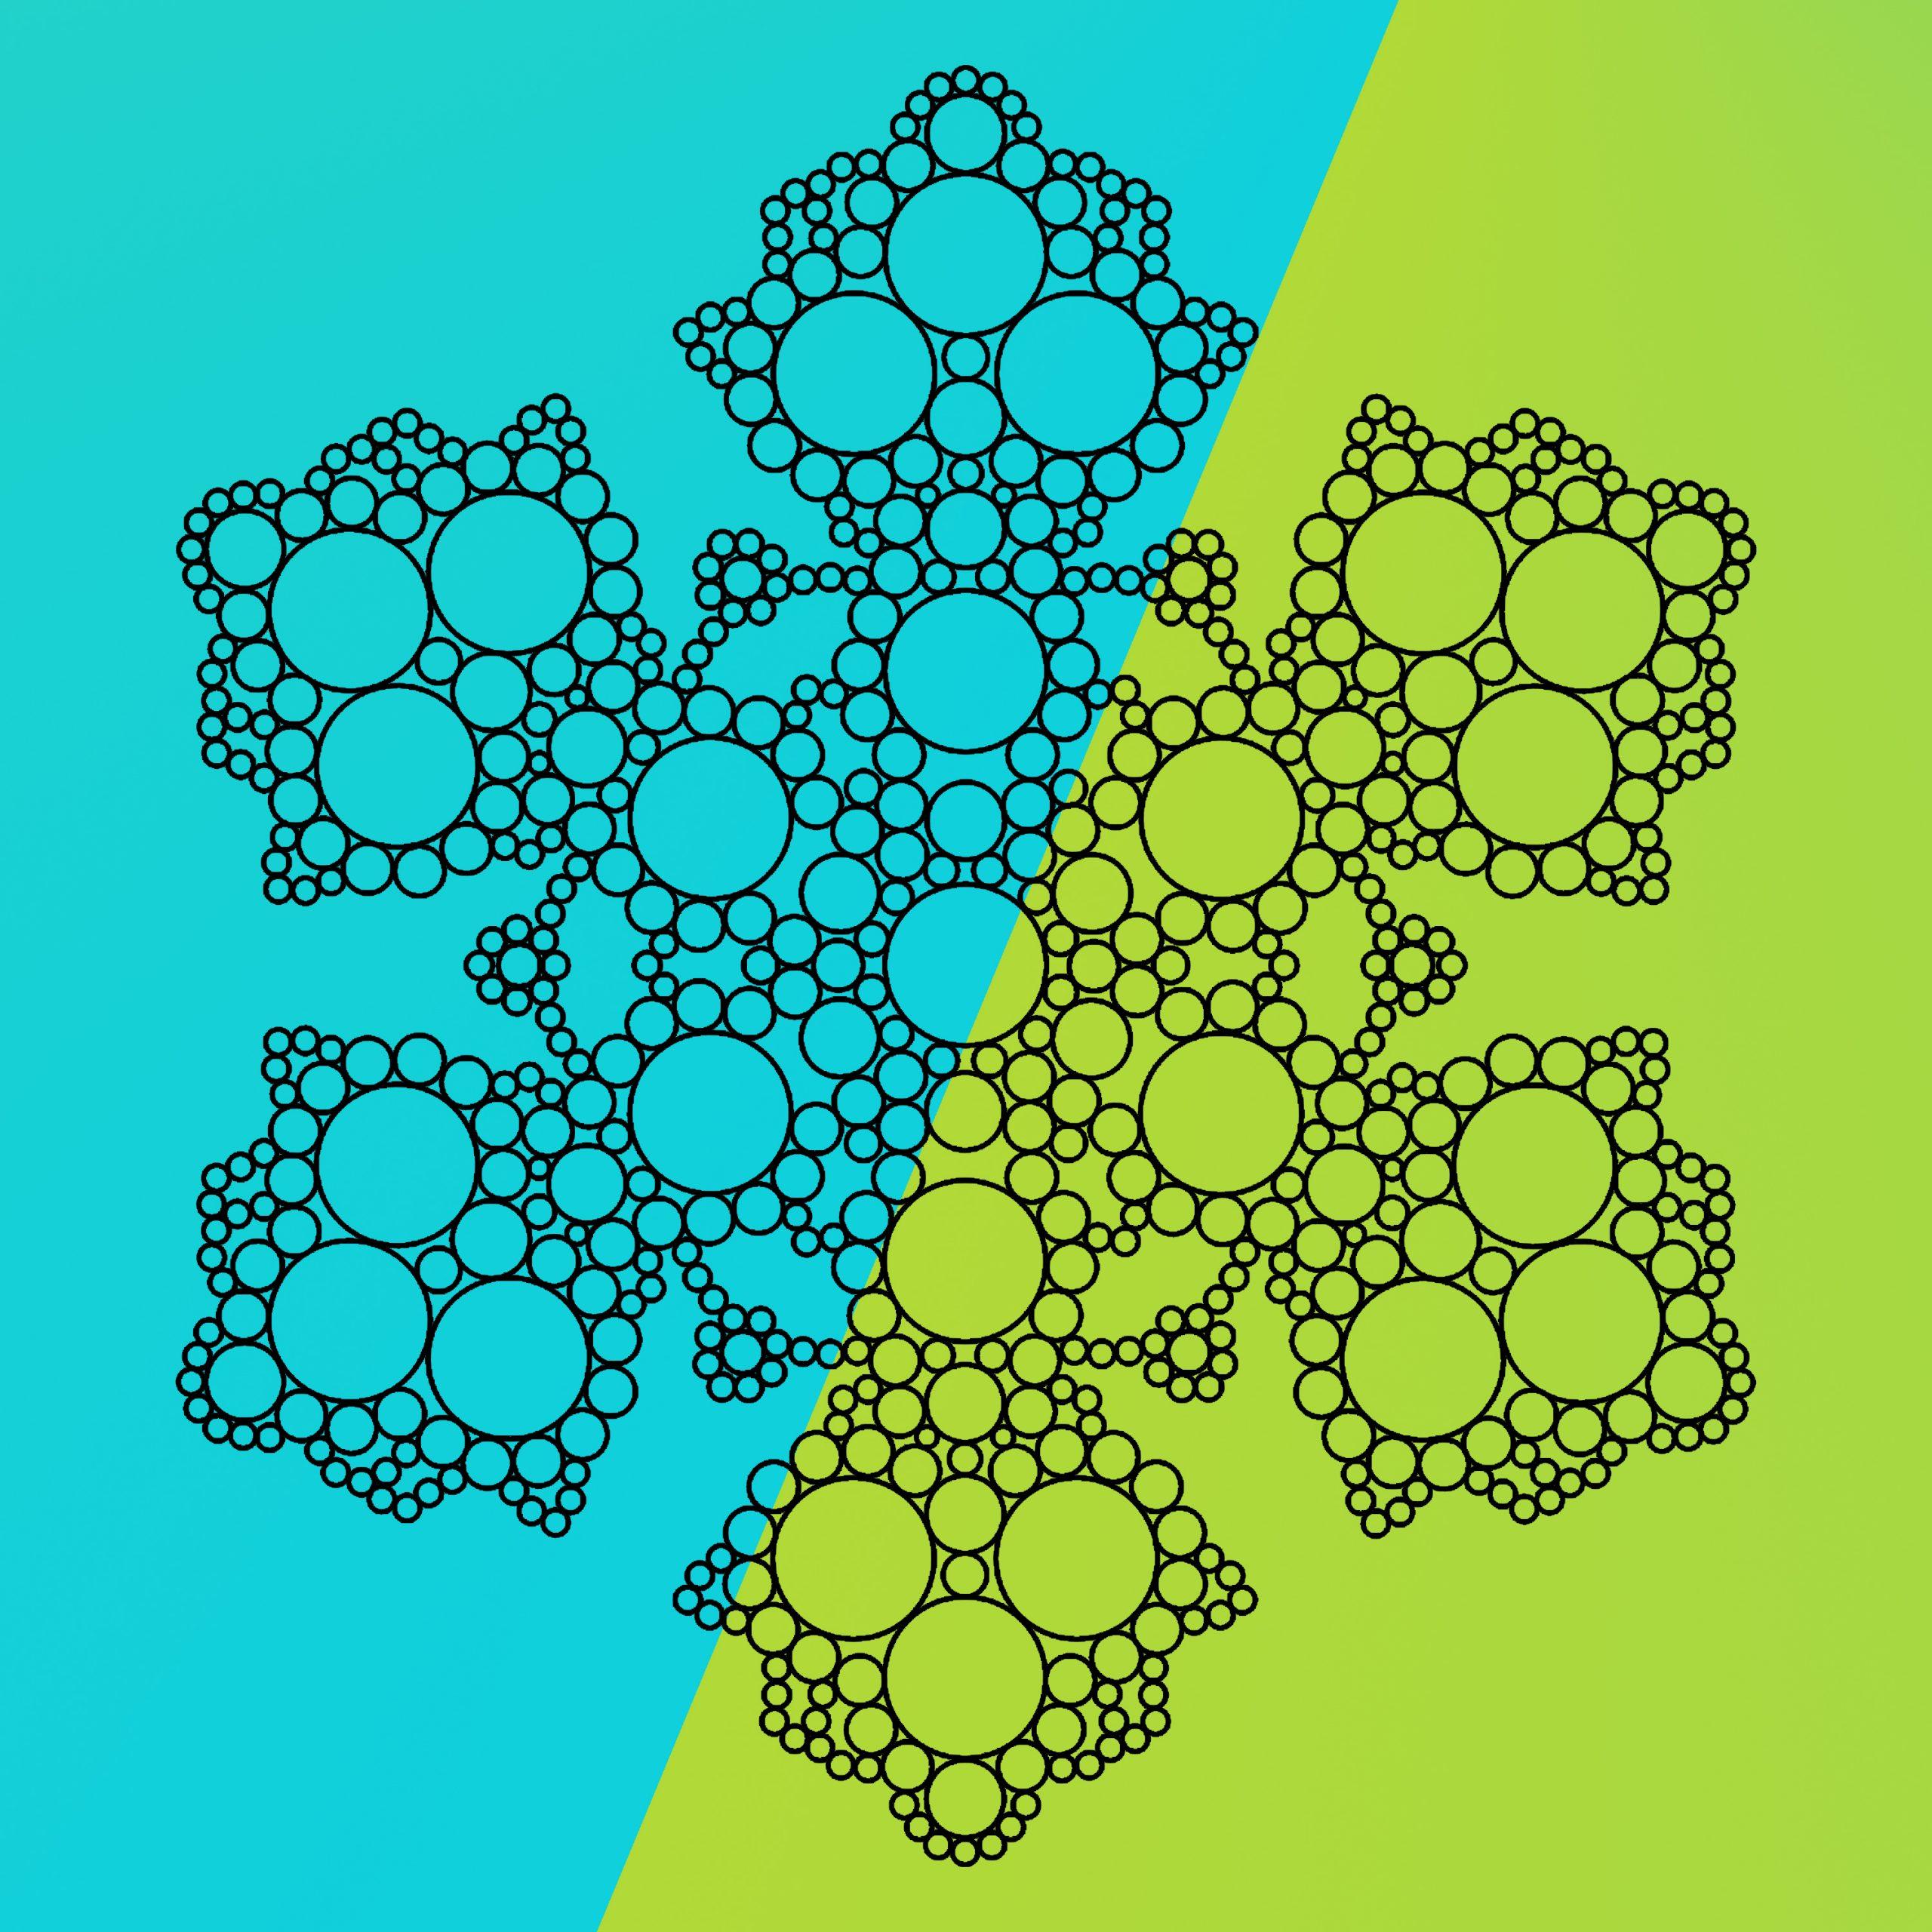 Pattern design illustration